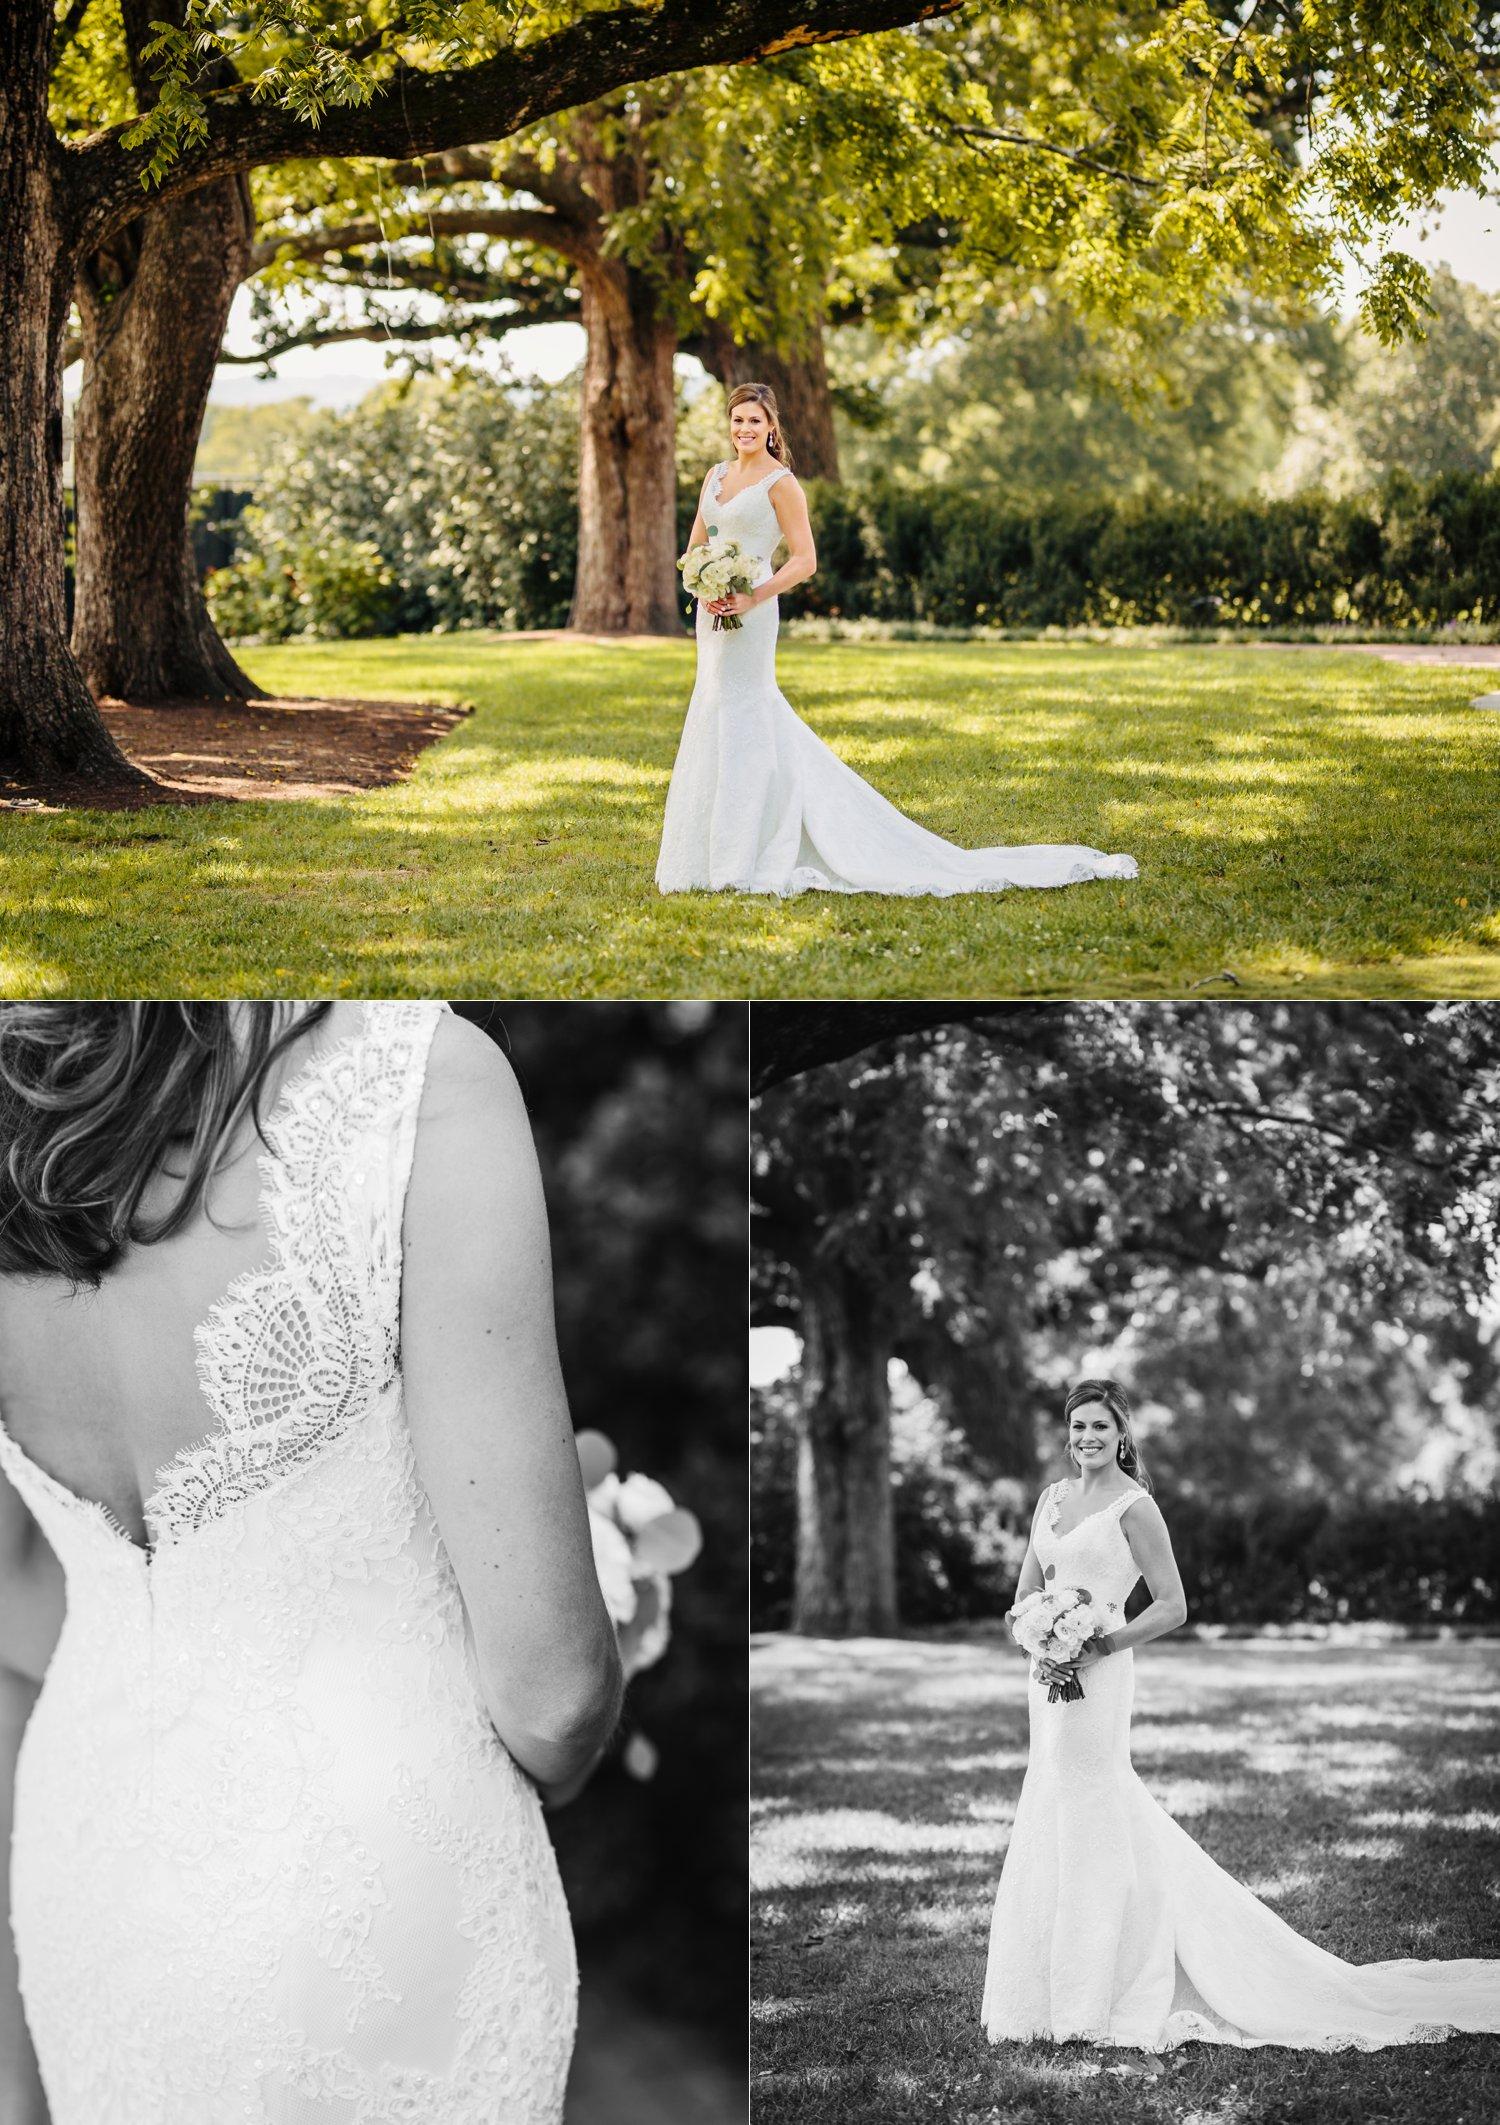 CK-Photo-Nashville-engagement-wedding-photographer-belle-meade-country-club